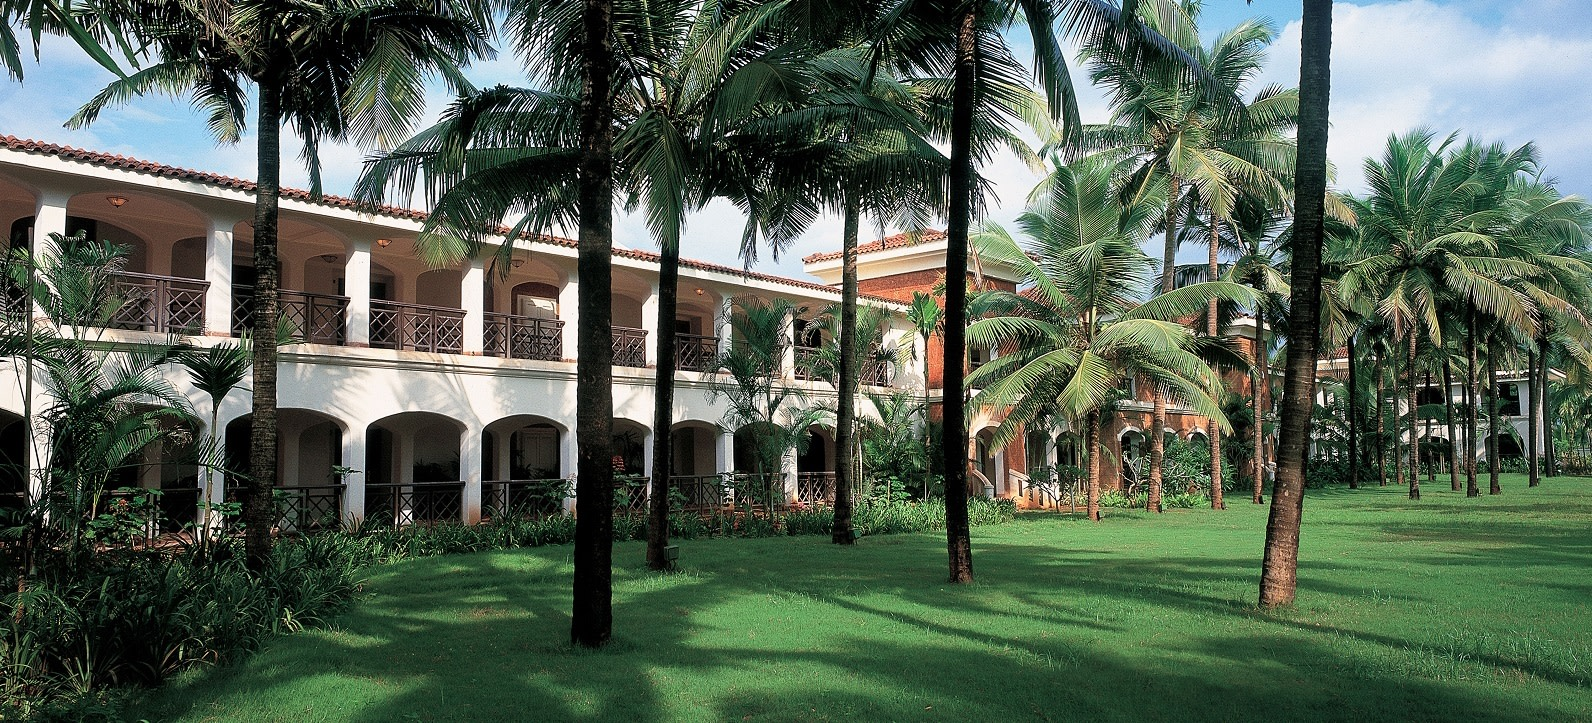 Taj Exotica Hotel in Islands & Beaches | ENCHANTING TRAVELS